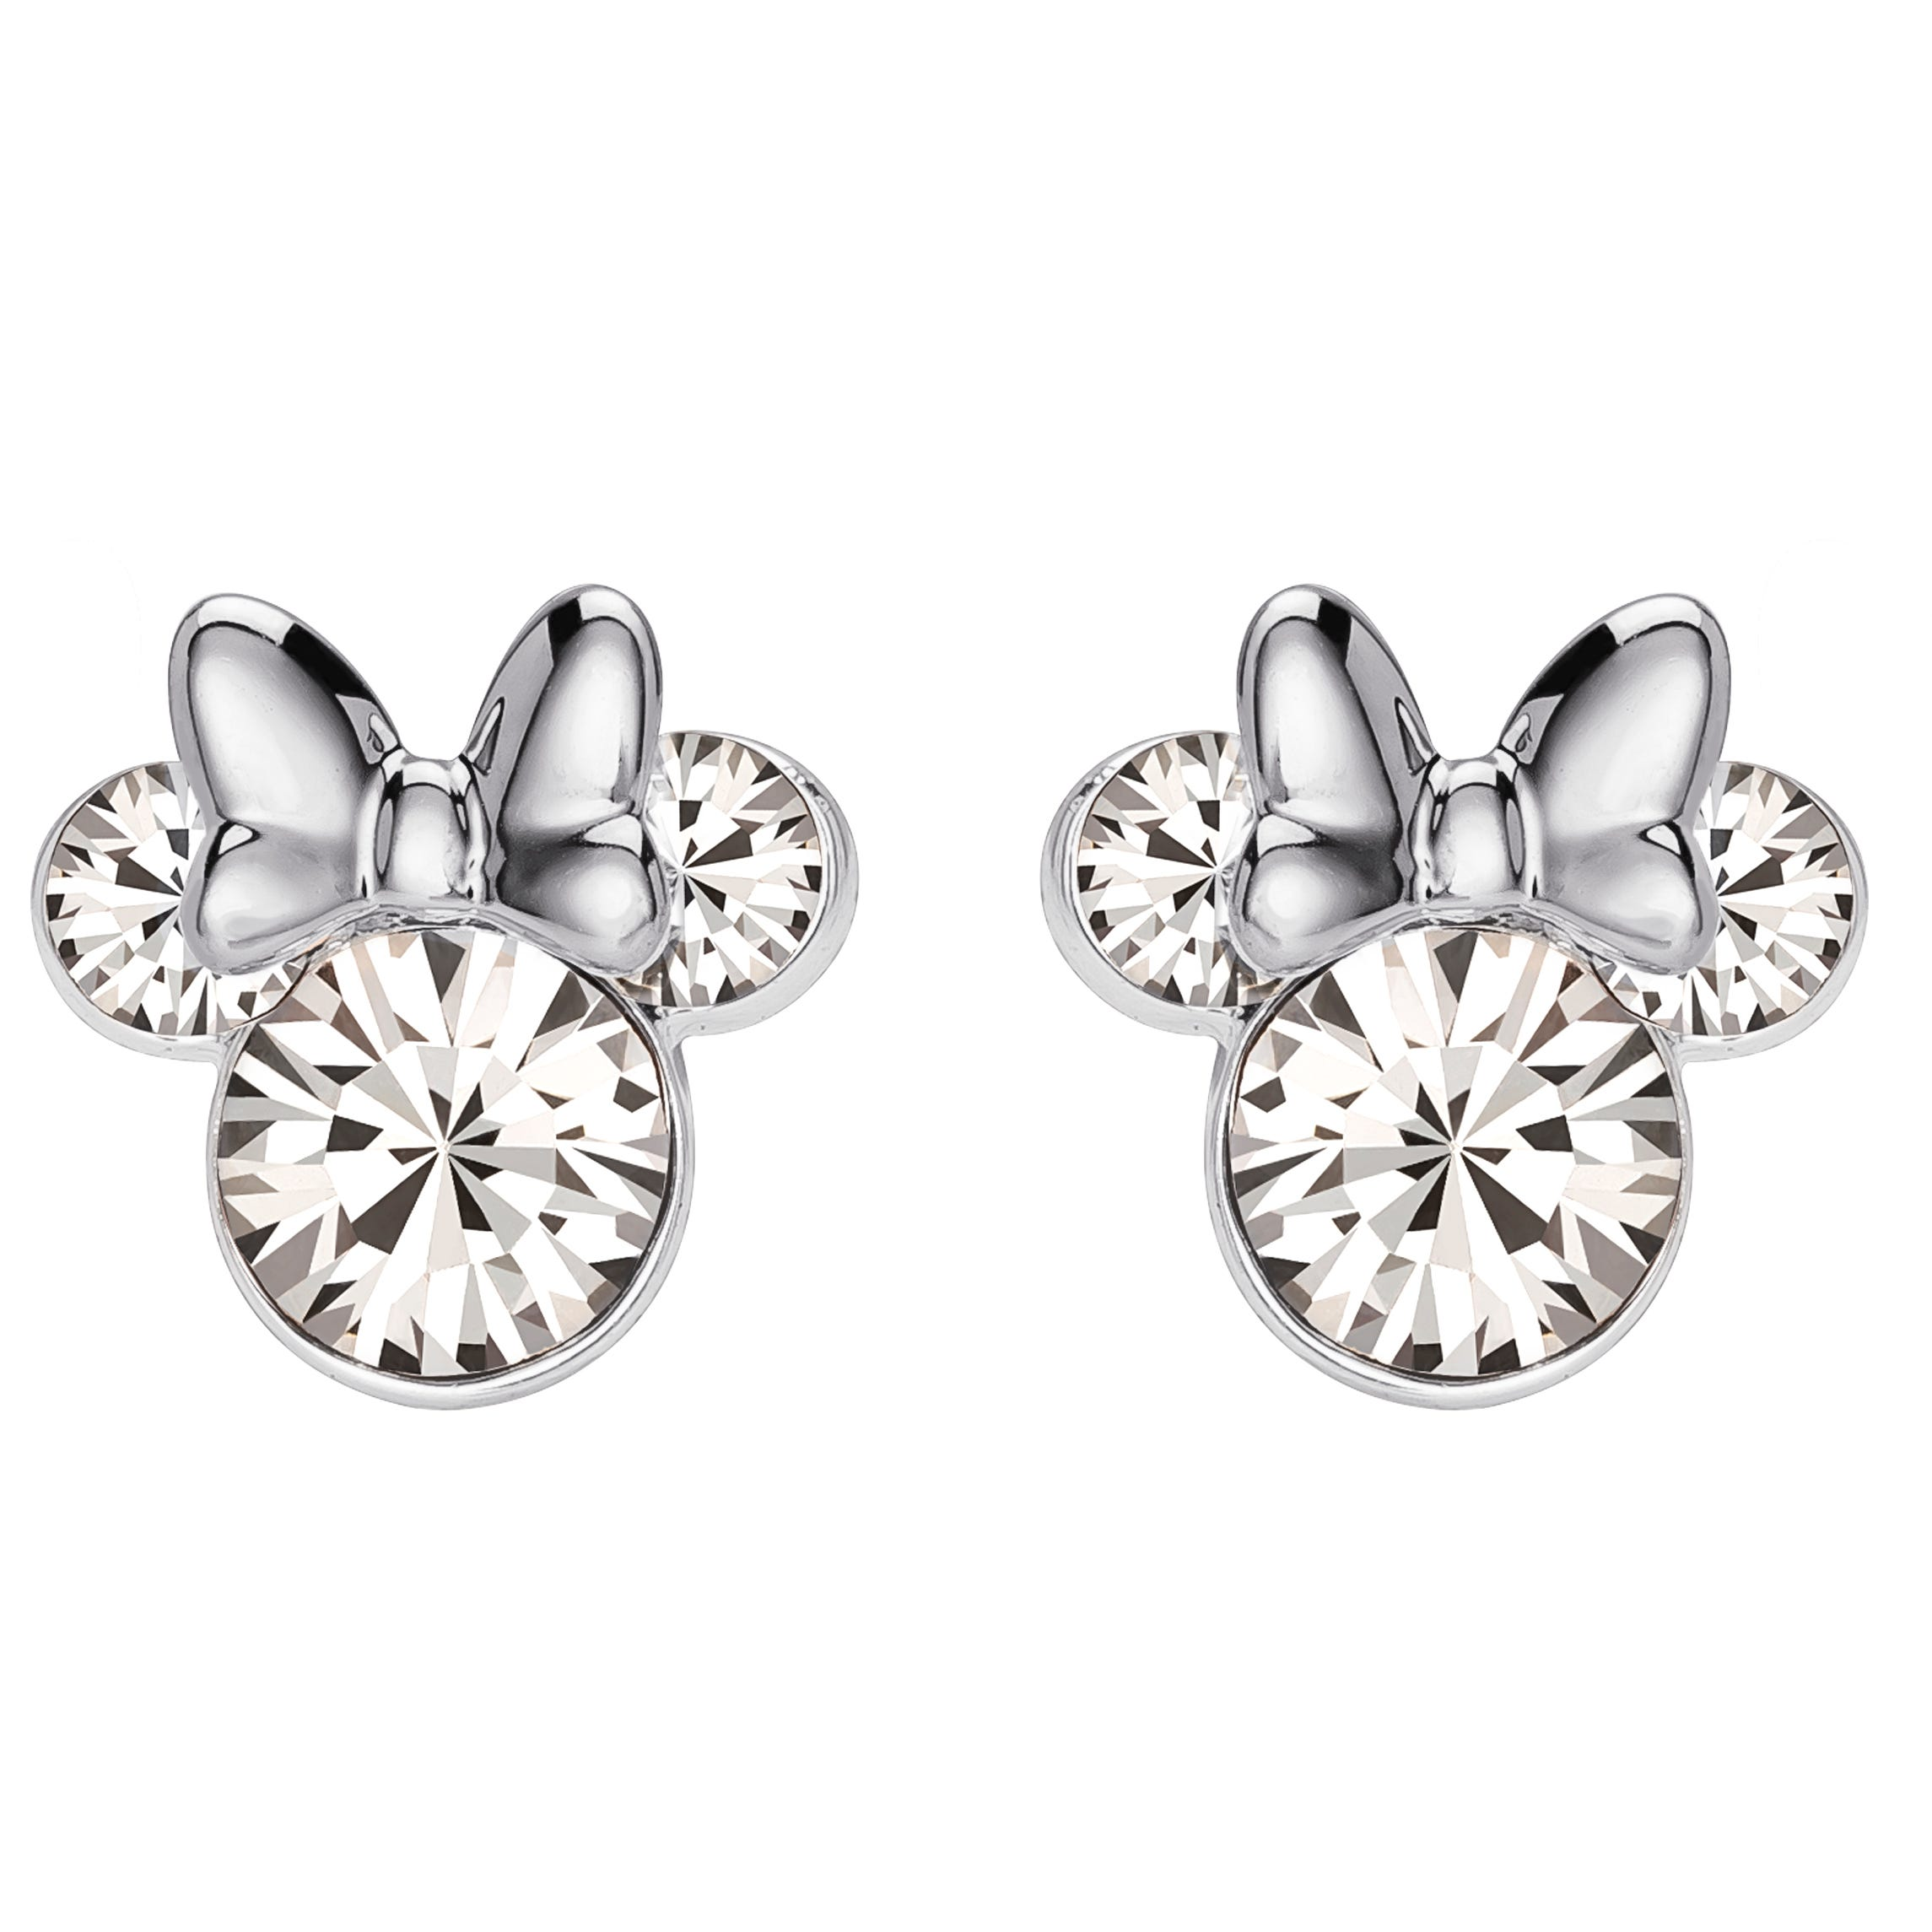 DISNEY© Minnie Mouse Crystal Stud Earrings in Sterling Silver